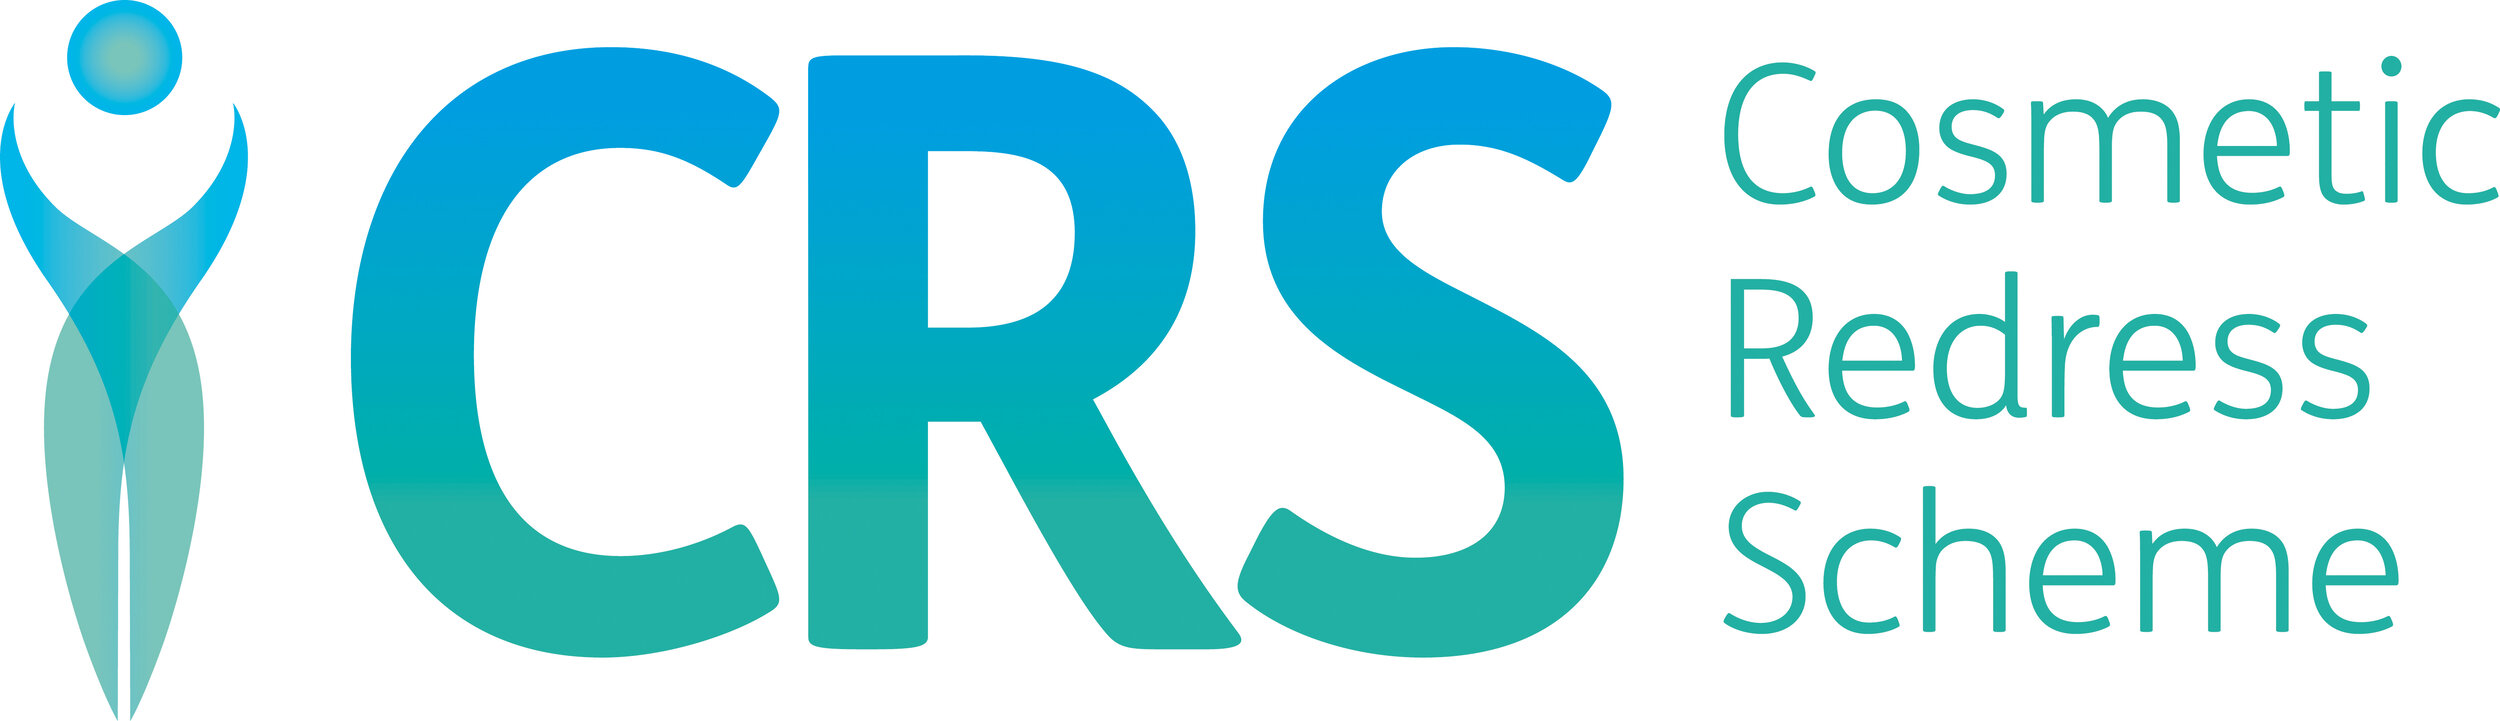 CRS_logo_RGB.JPG